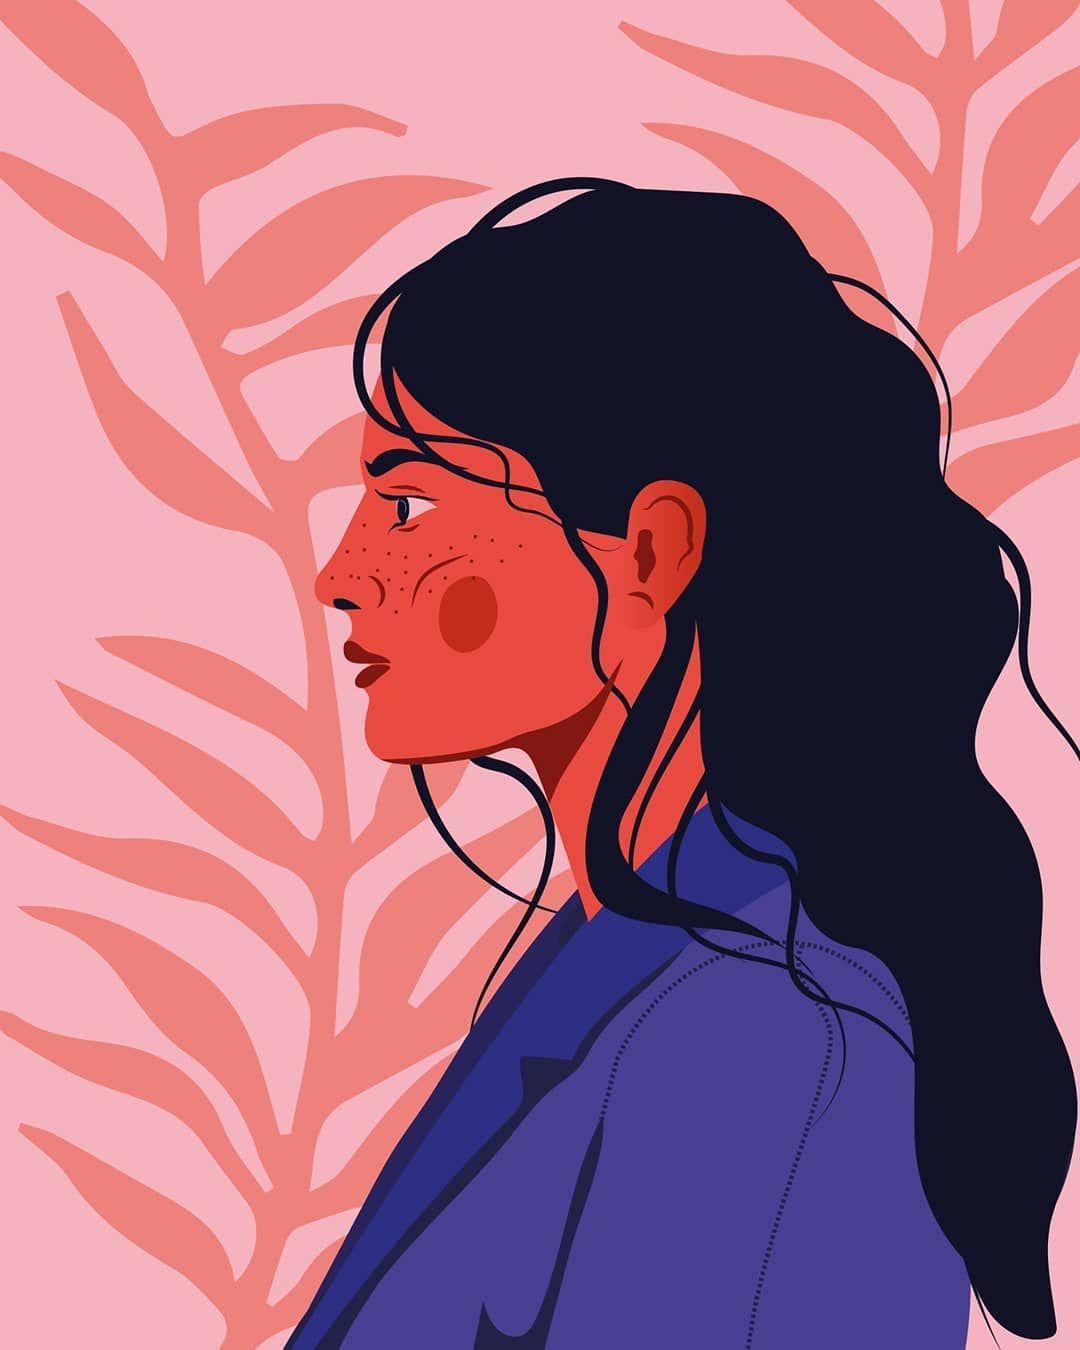 Draw Design Digital Art Illustration Art Inspiration Drawing Illustrators On Instagram